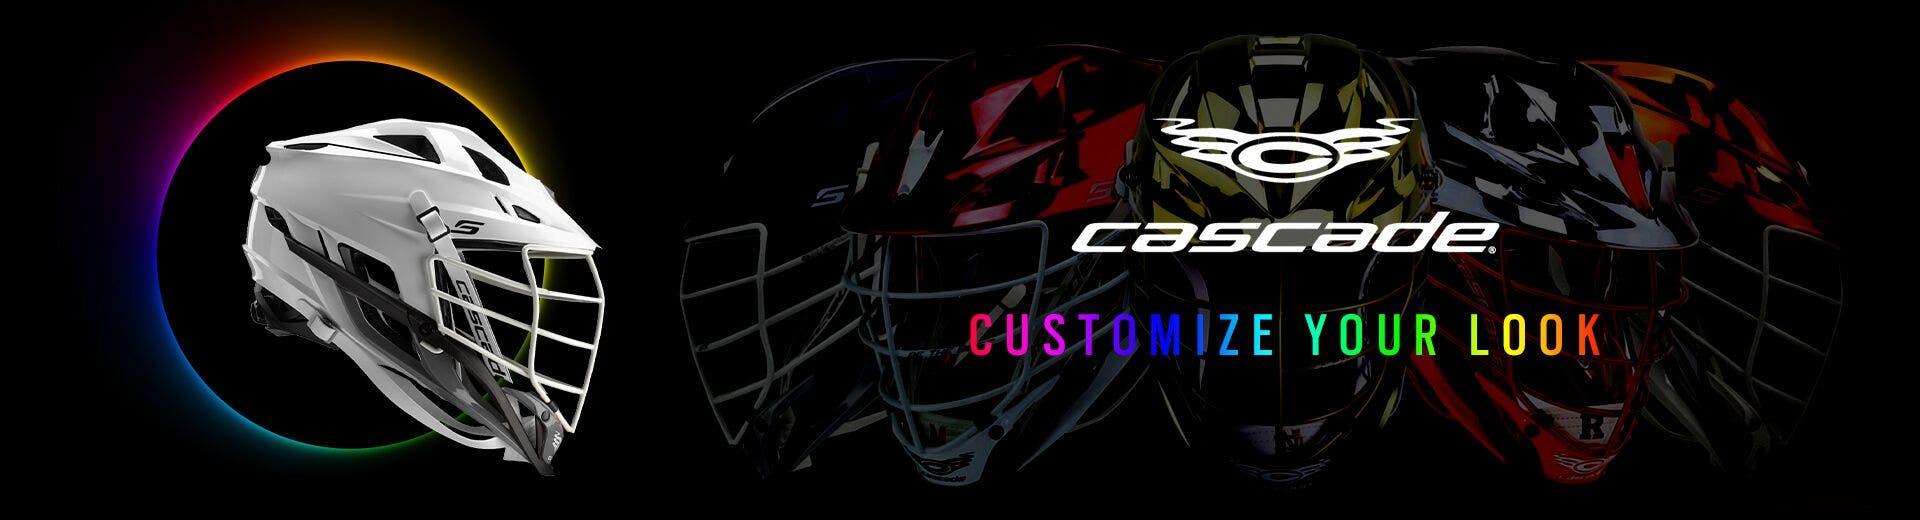 Custom Cascade Lacrosse Helmet - DESKTOP